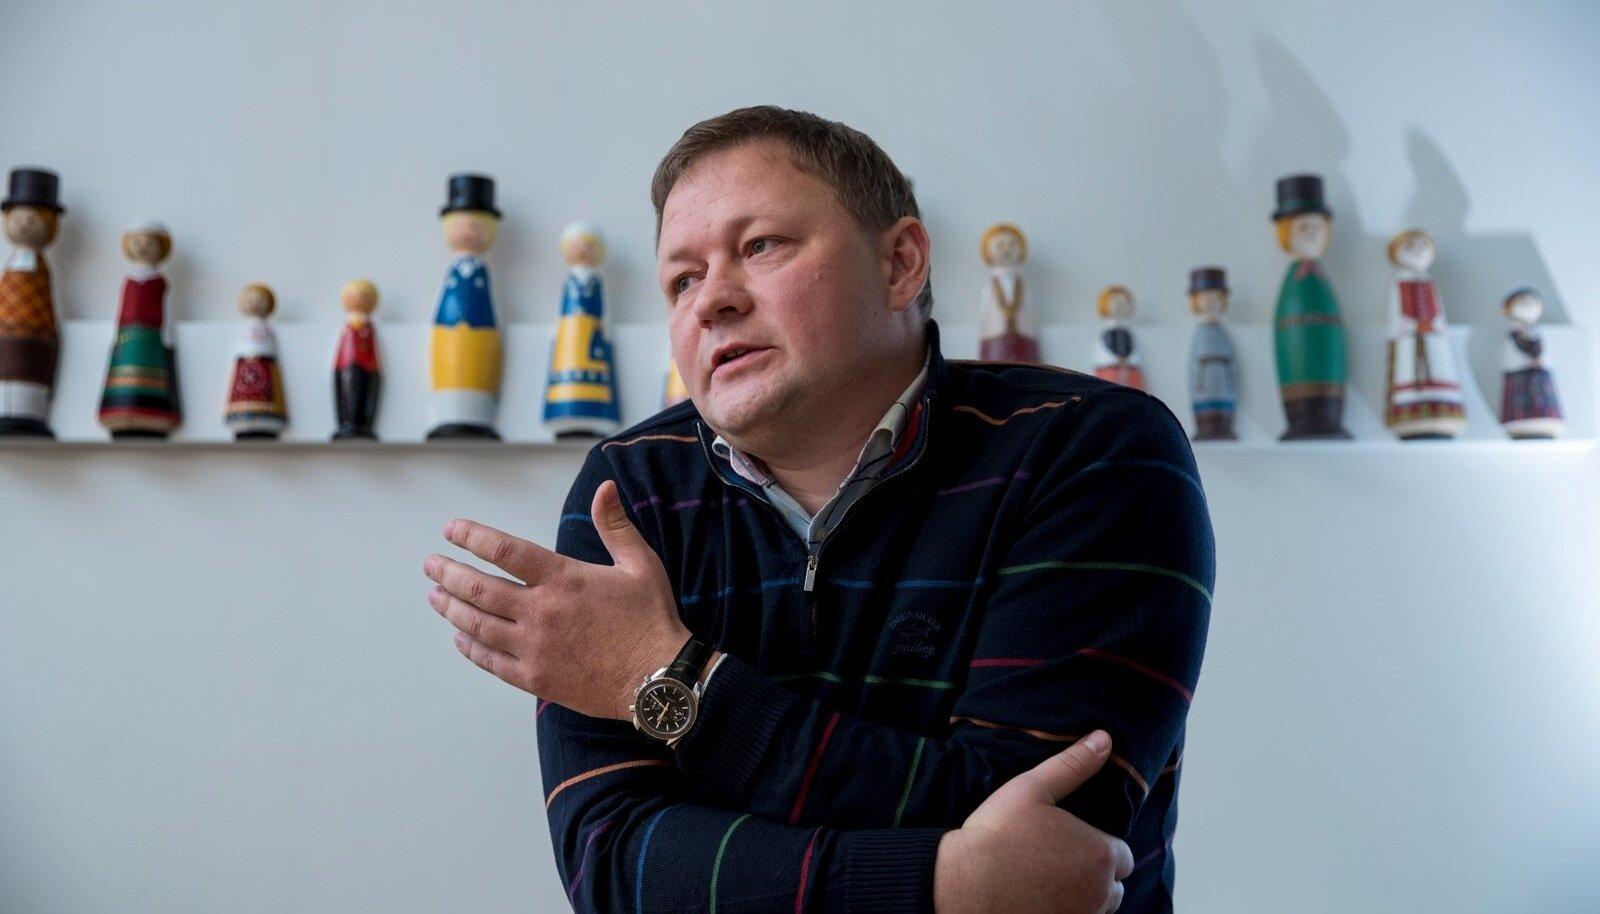 Raul Kirjanen